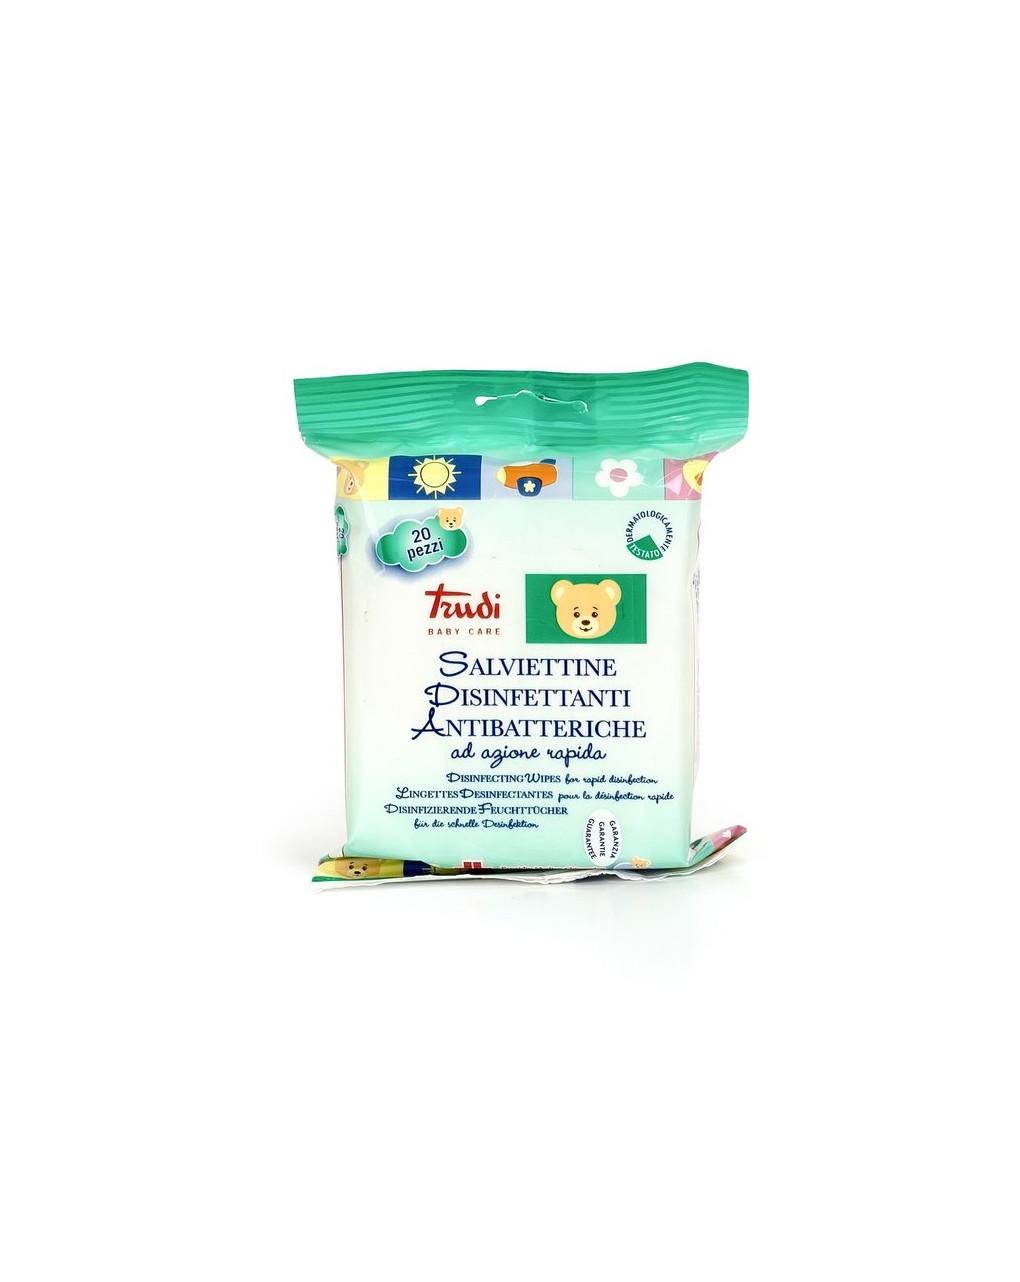 Salviettine antibatteriche 20pz - Trudi